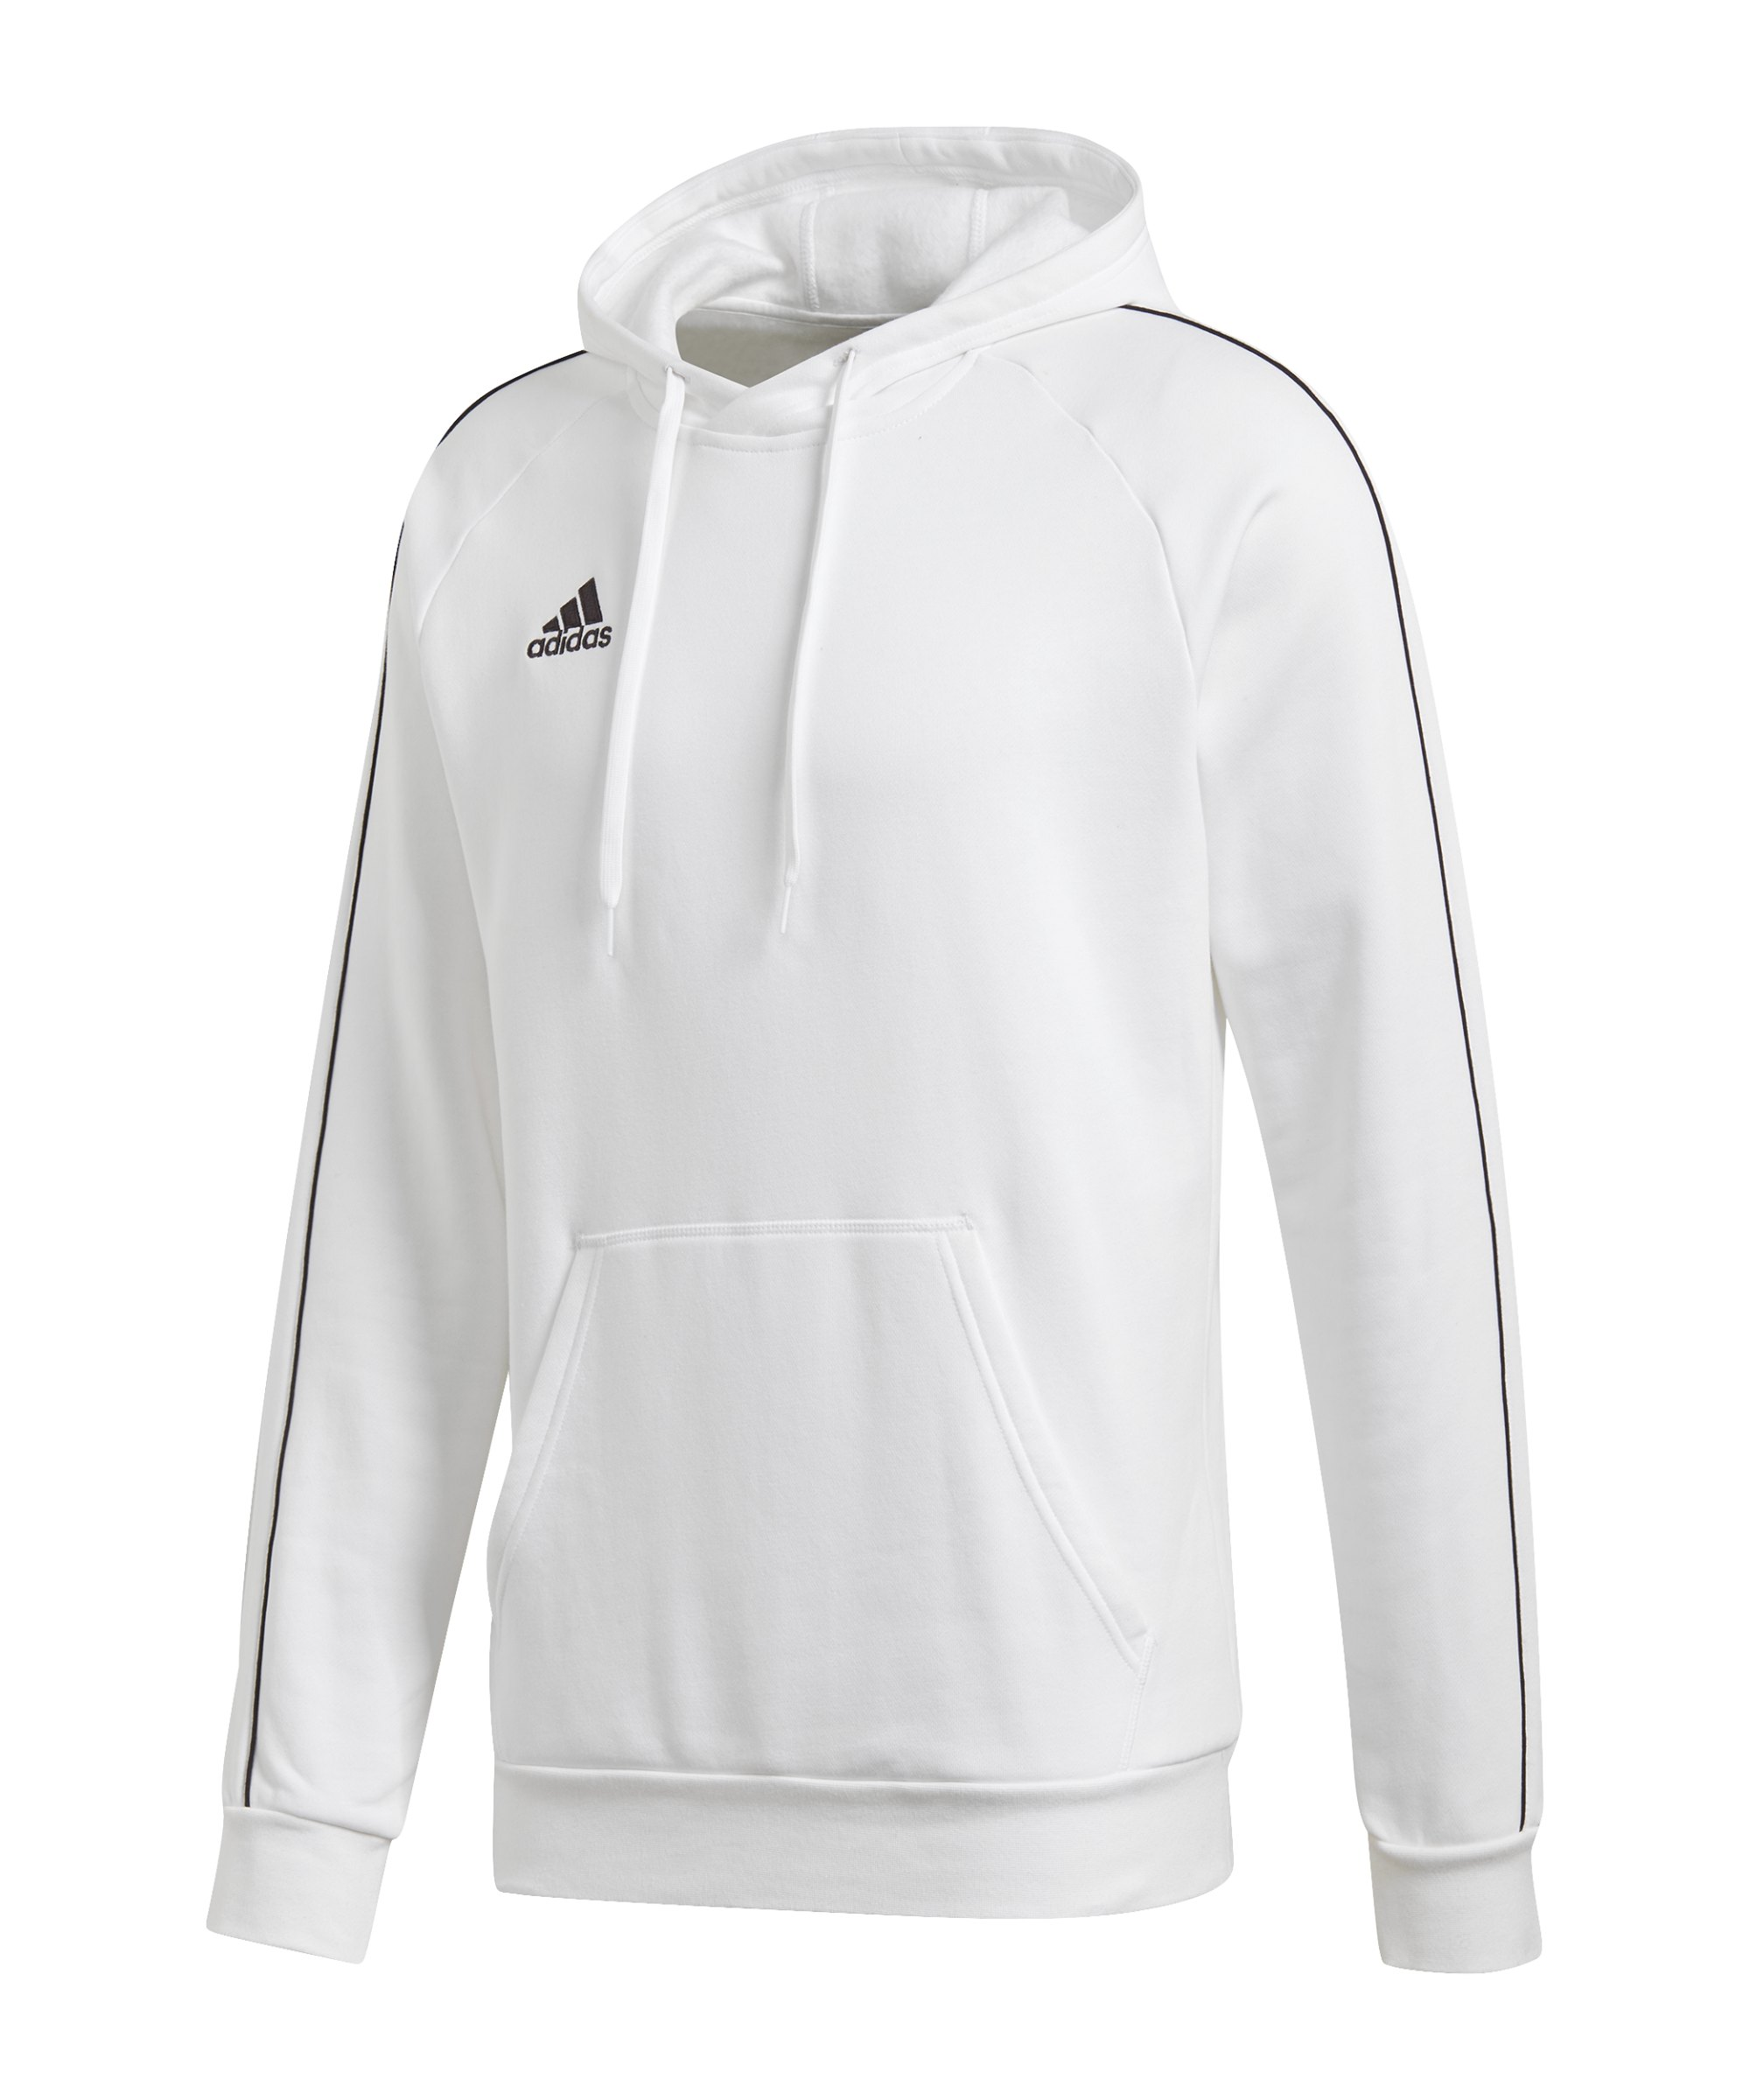 adidas Core 18 Hoody Kapuzensweatshirt Weiss - weiss